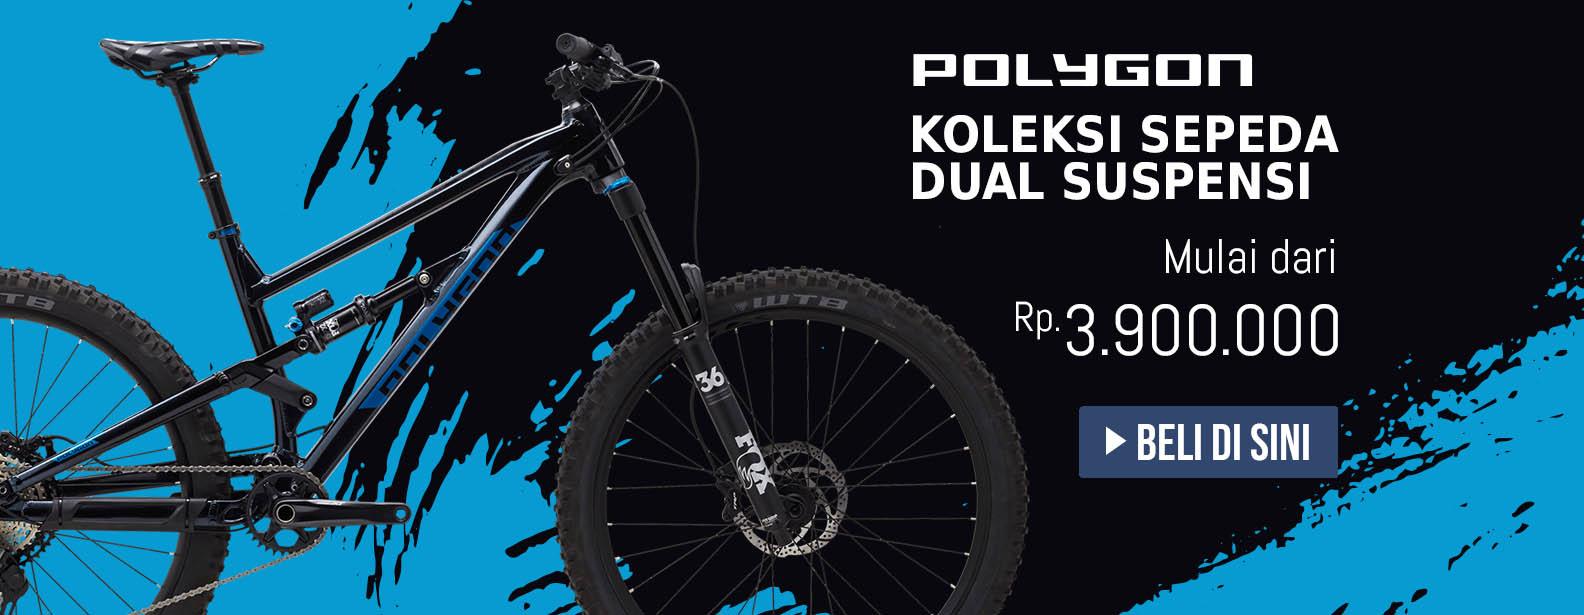 Koleksi Polygon Sepeda Dual Suspensi